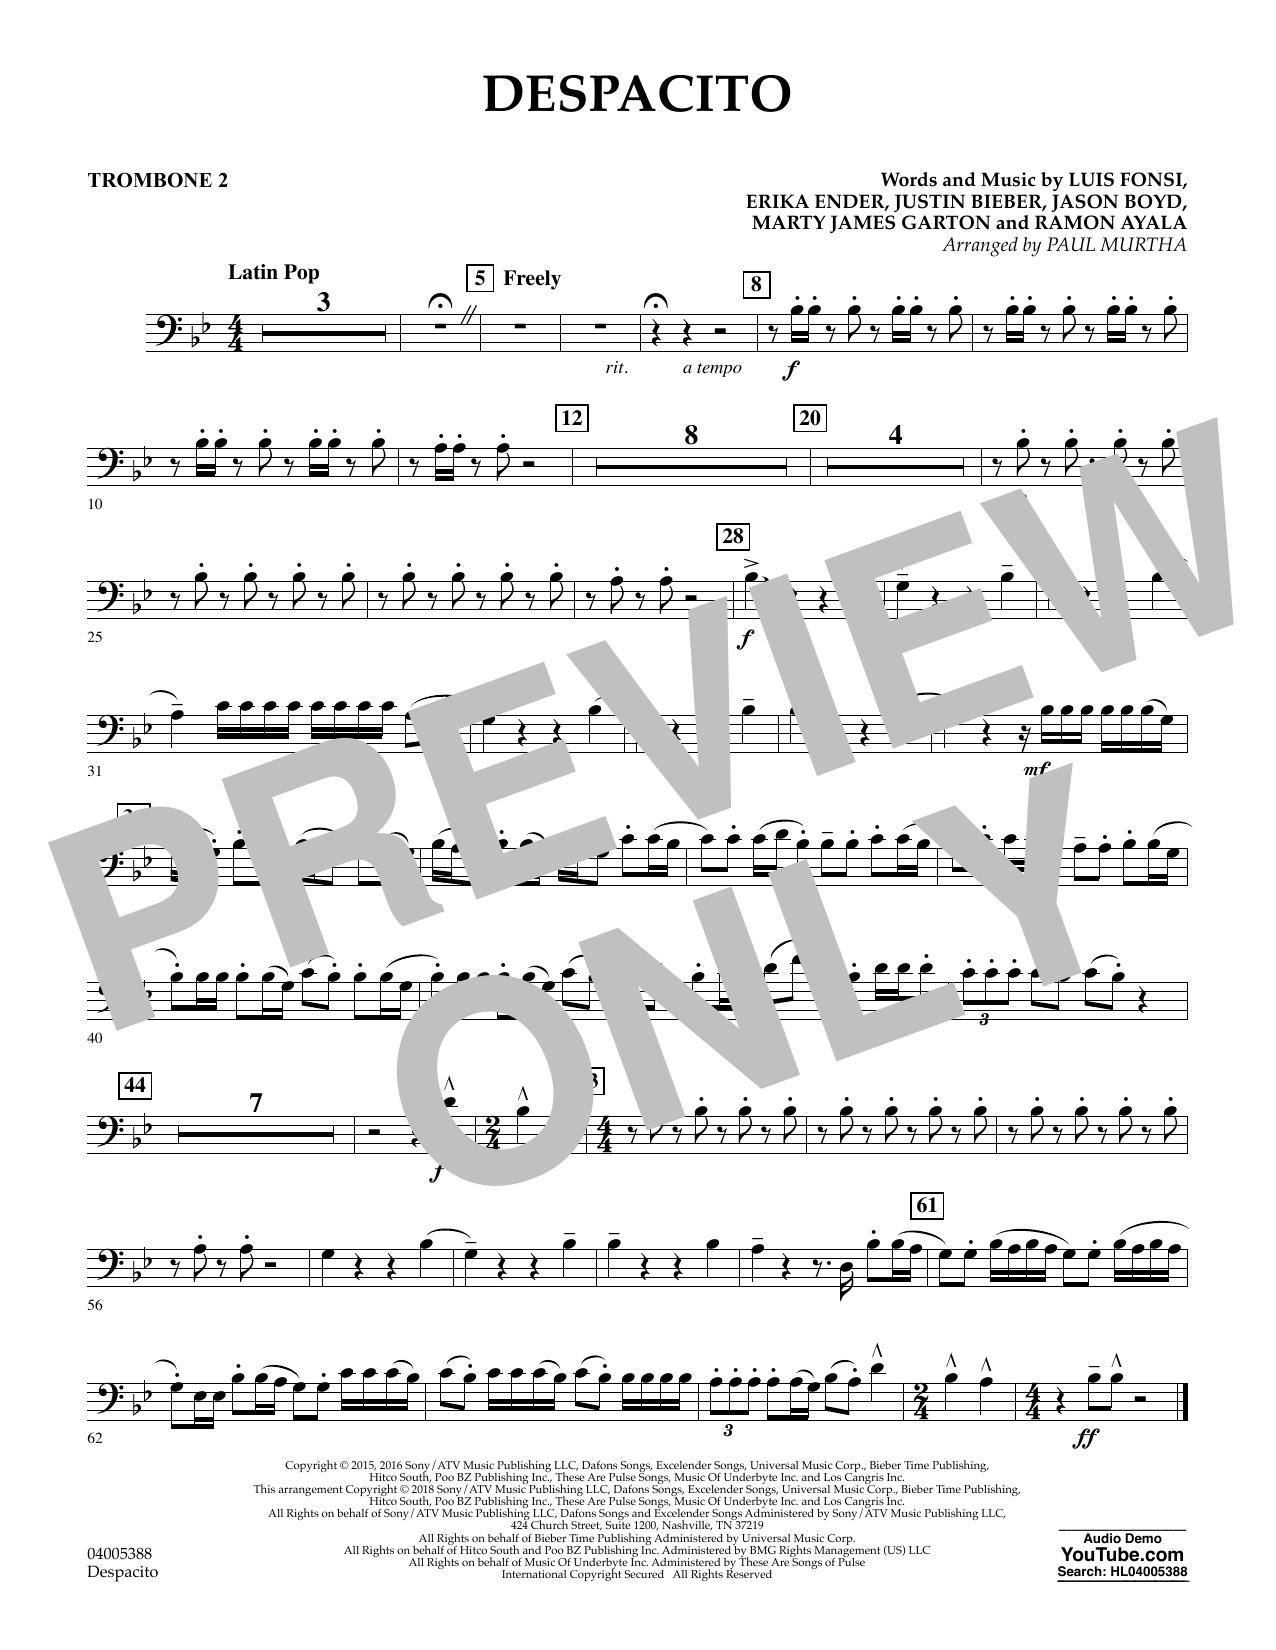 Despacito (arr. Paul Murtha) - Trombone 2 (Concert Band)